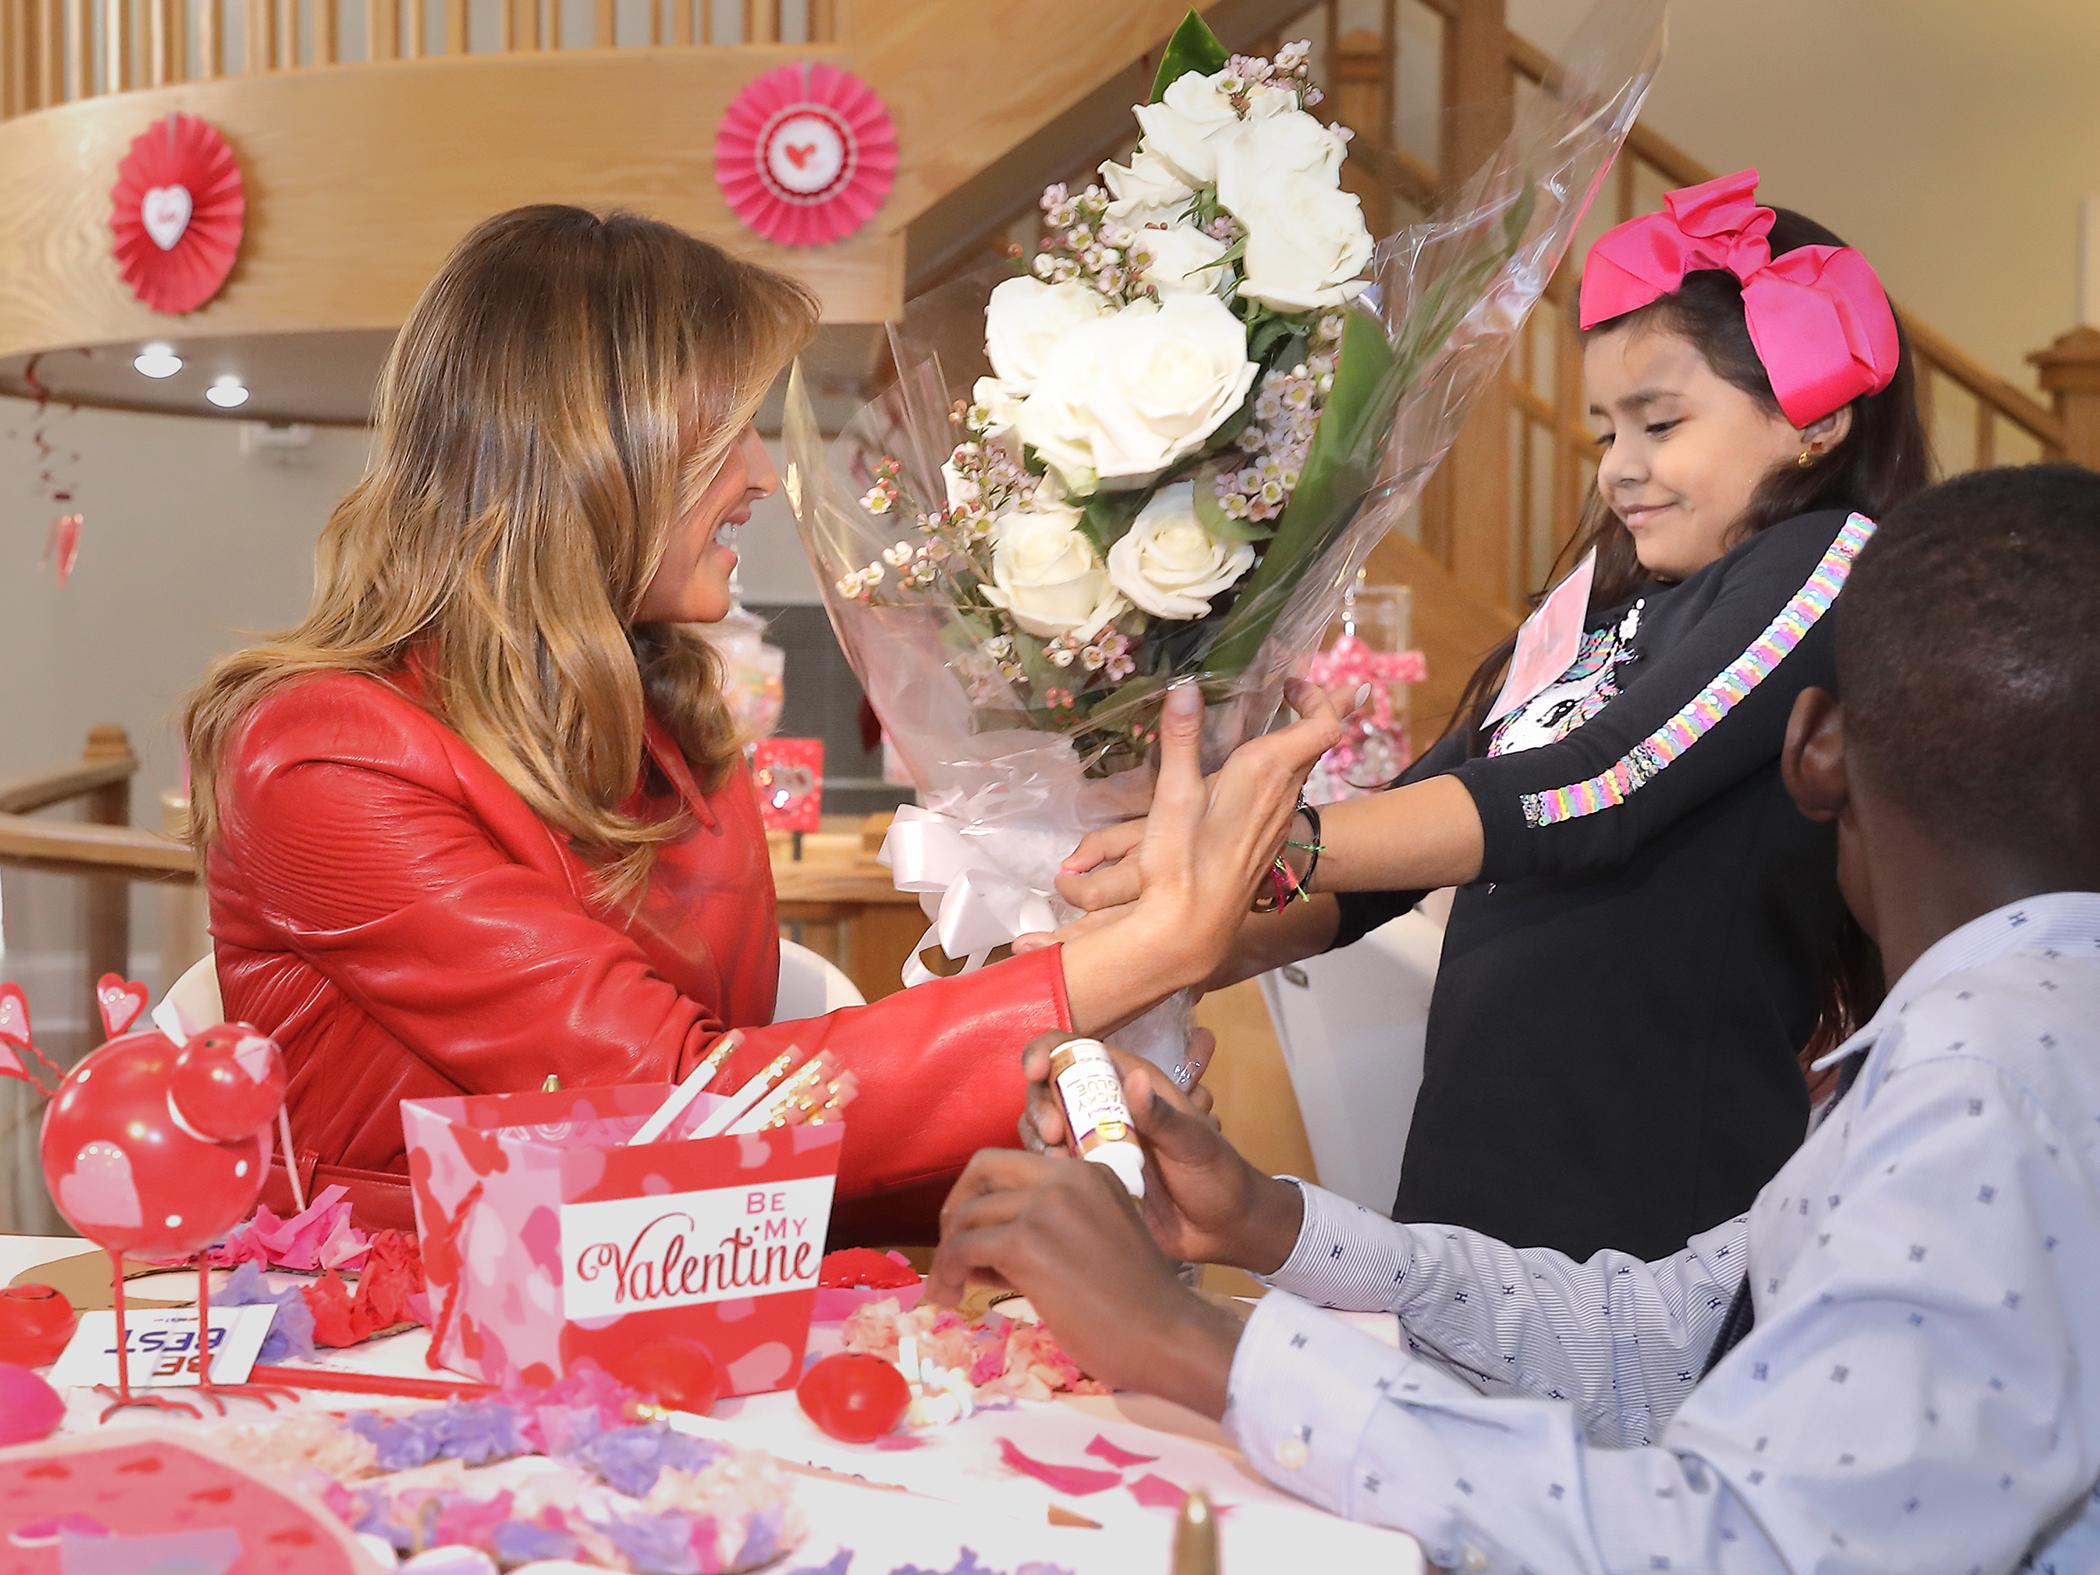 Inn resident Thais presents flowers to First Lady Melania Trump